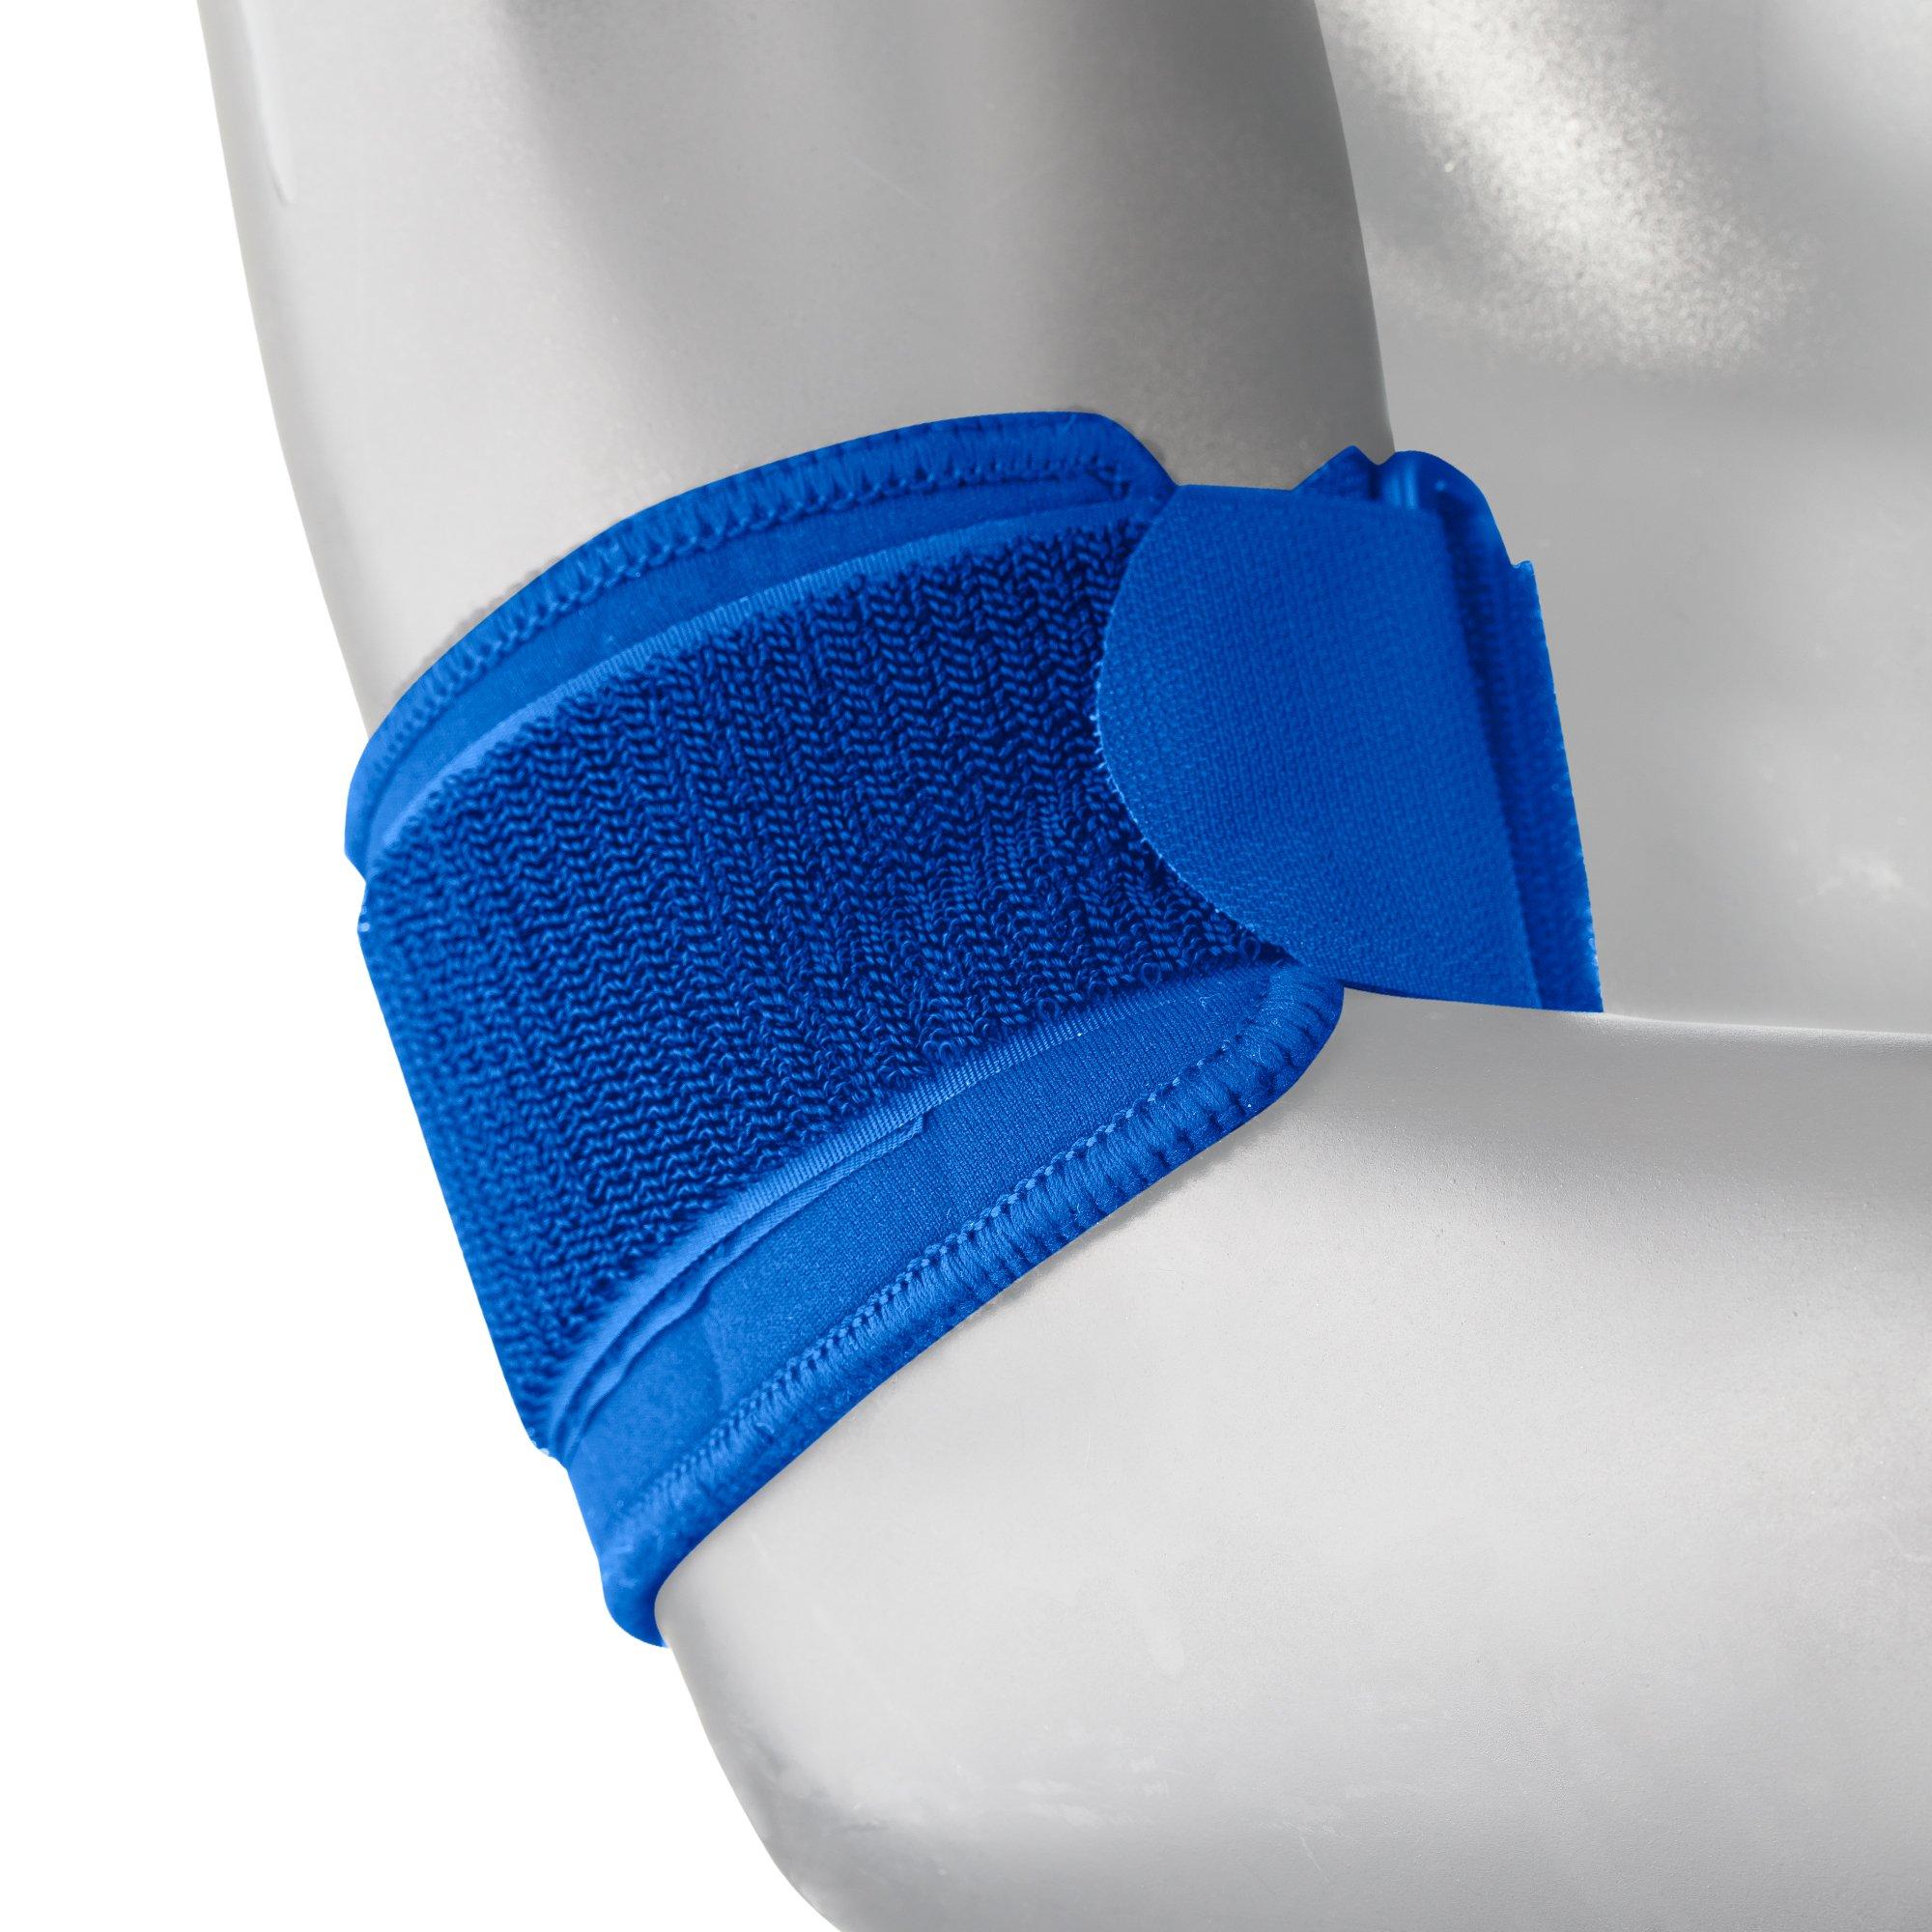 EVS Sports Unisex-Adult Neoprene Tennis Elbow Brace (Blue, Large)